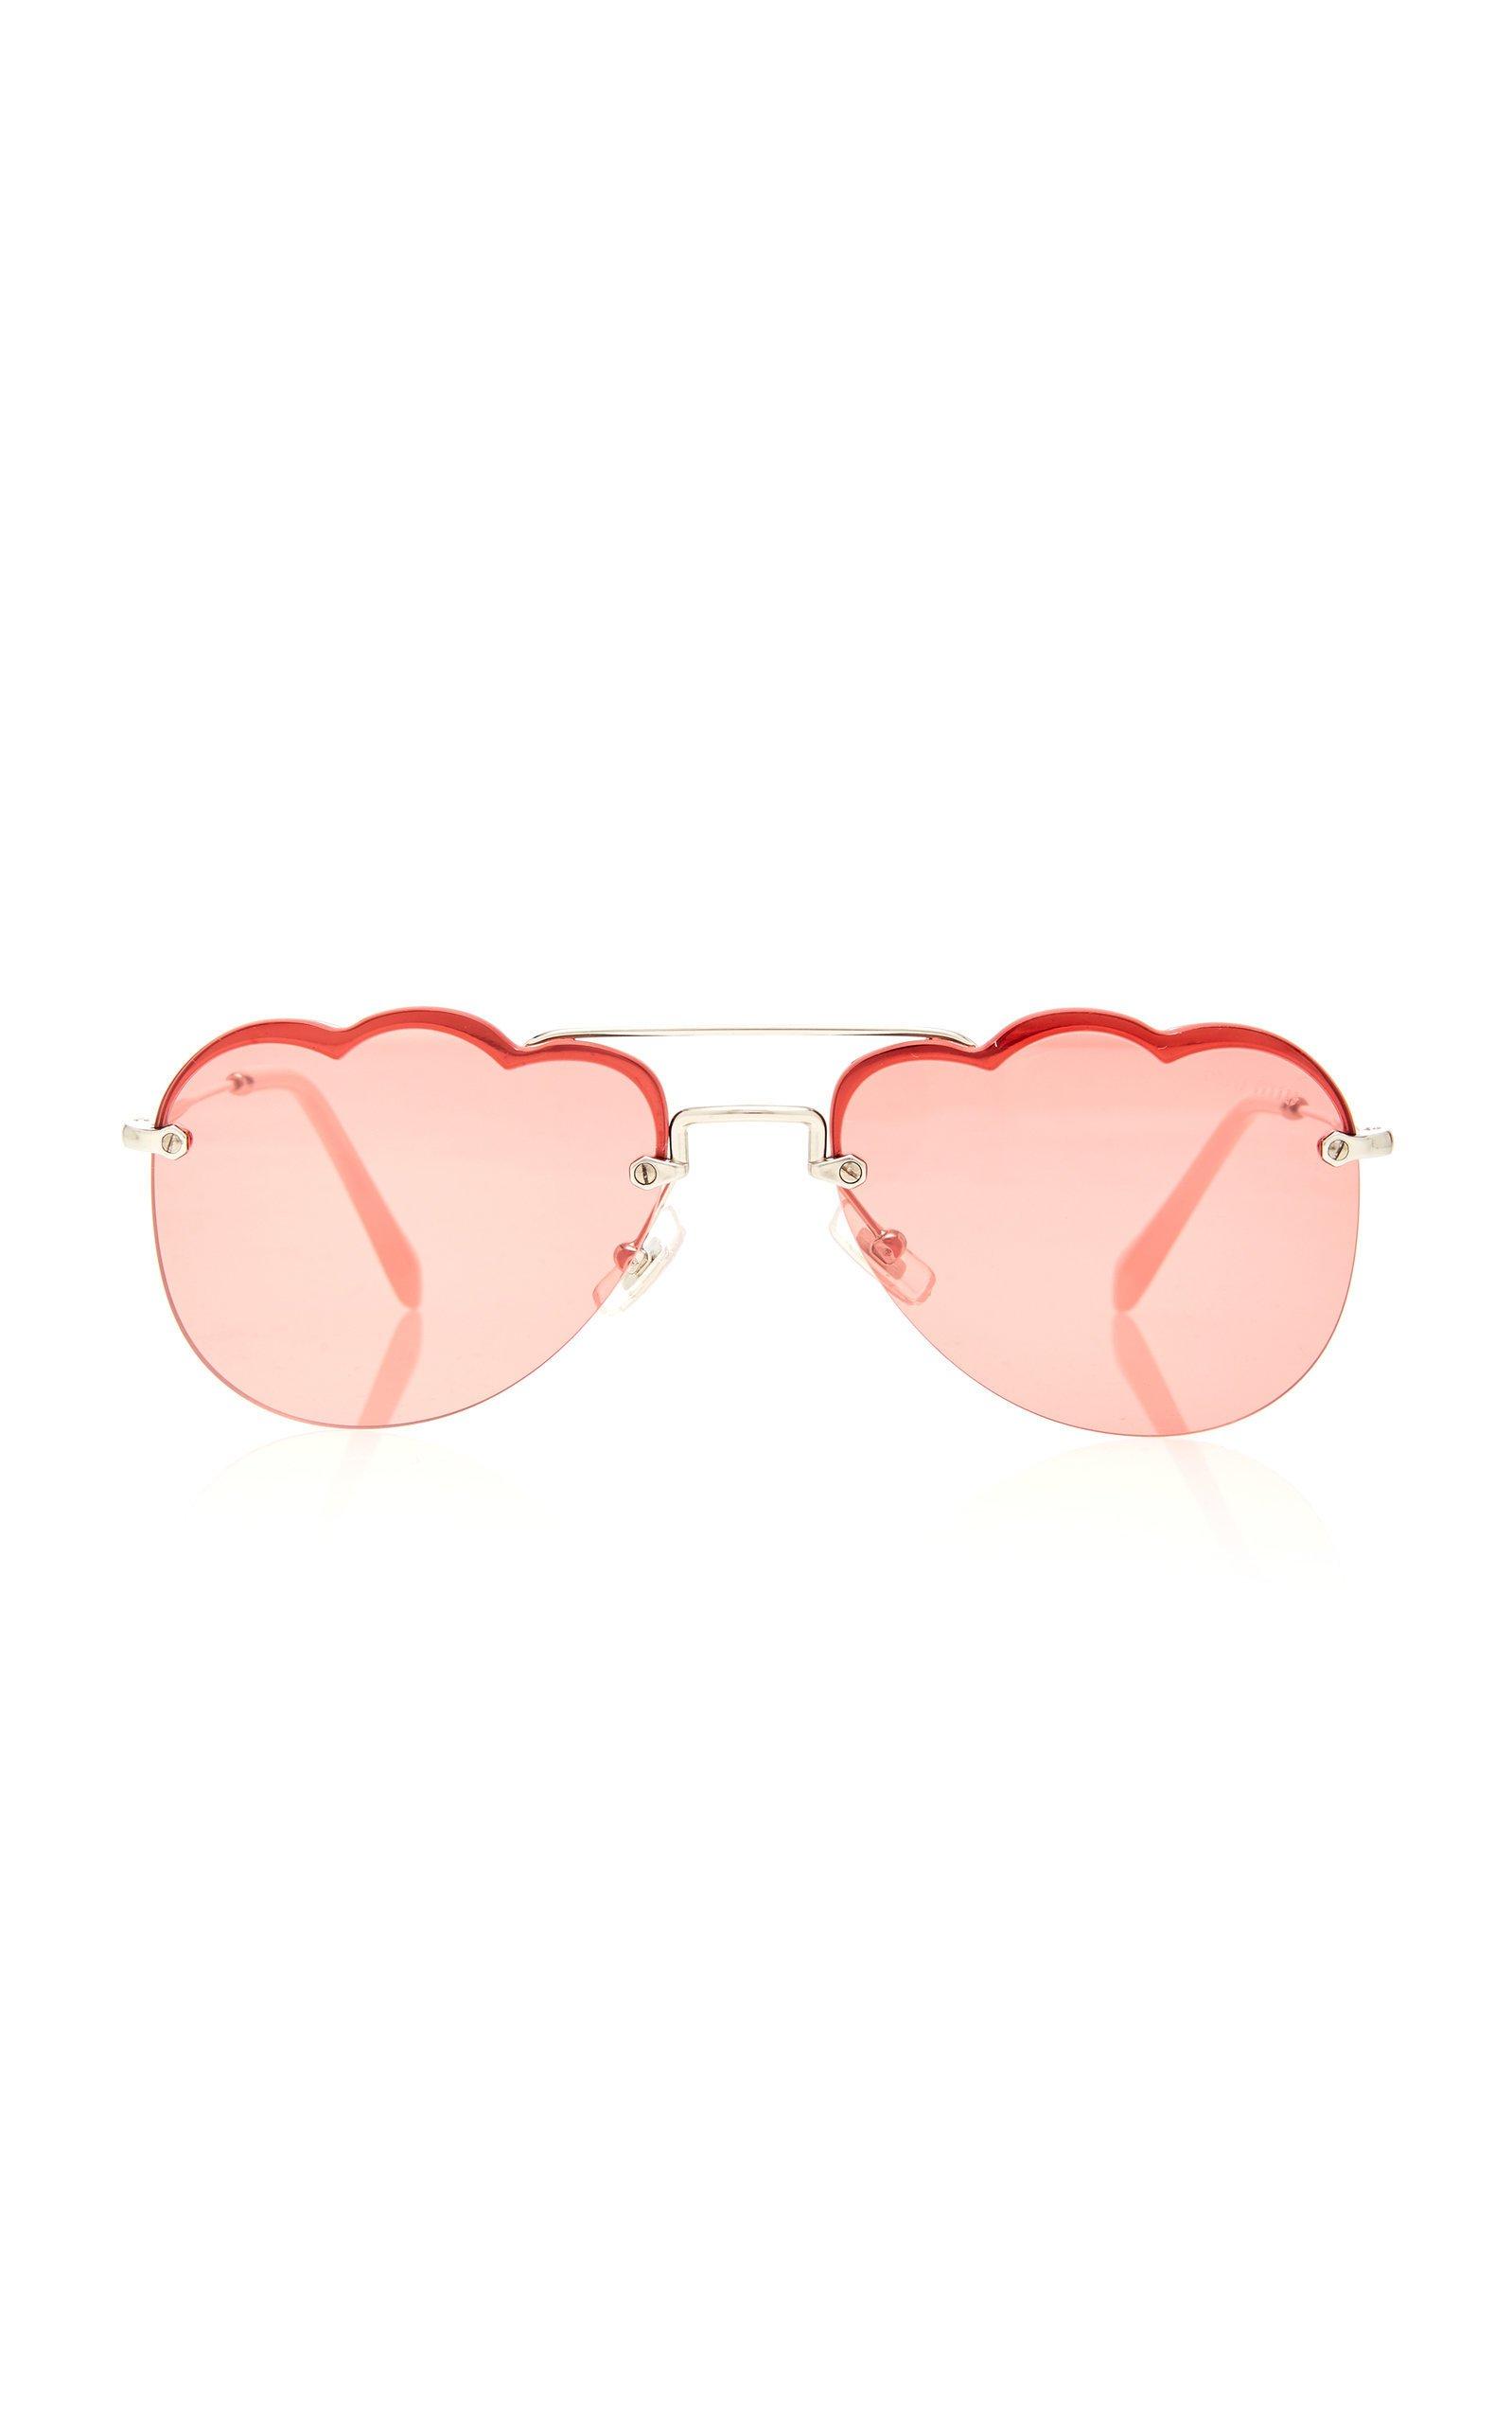 Miu Miu Sunglasses Aviator-Style Metal Sunglasses